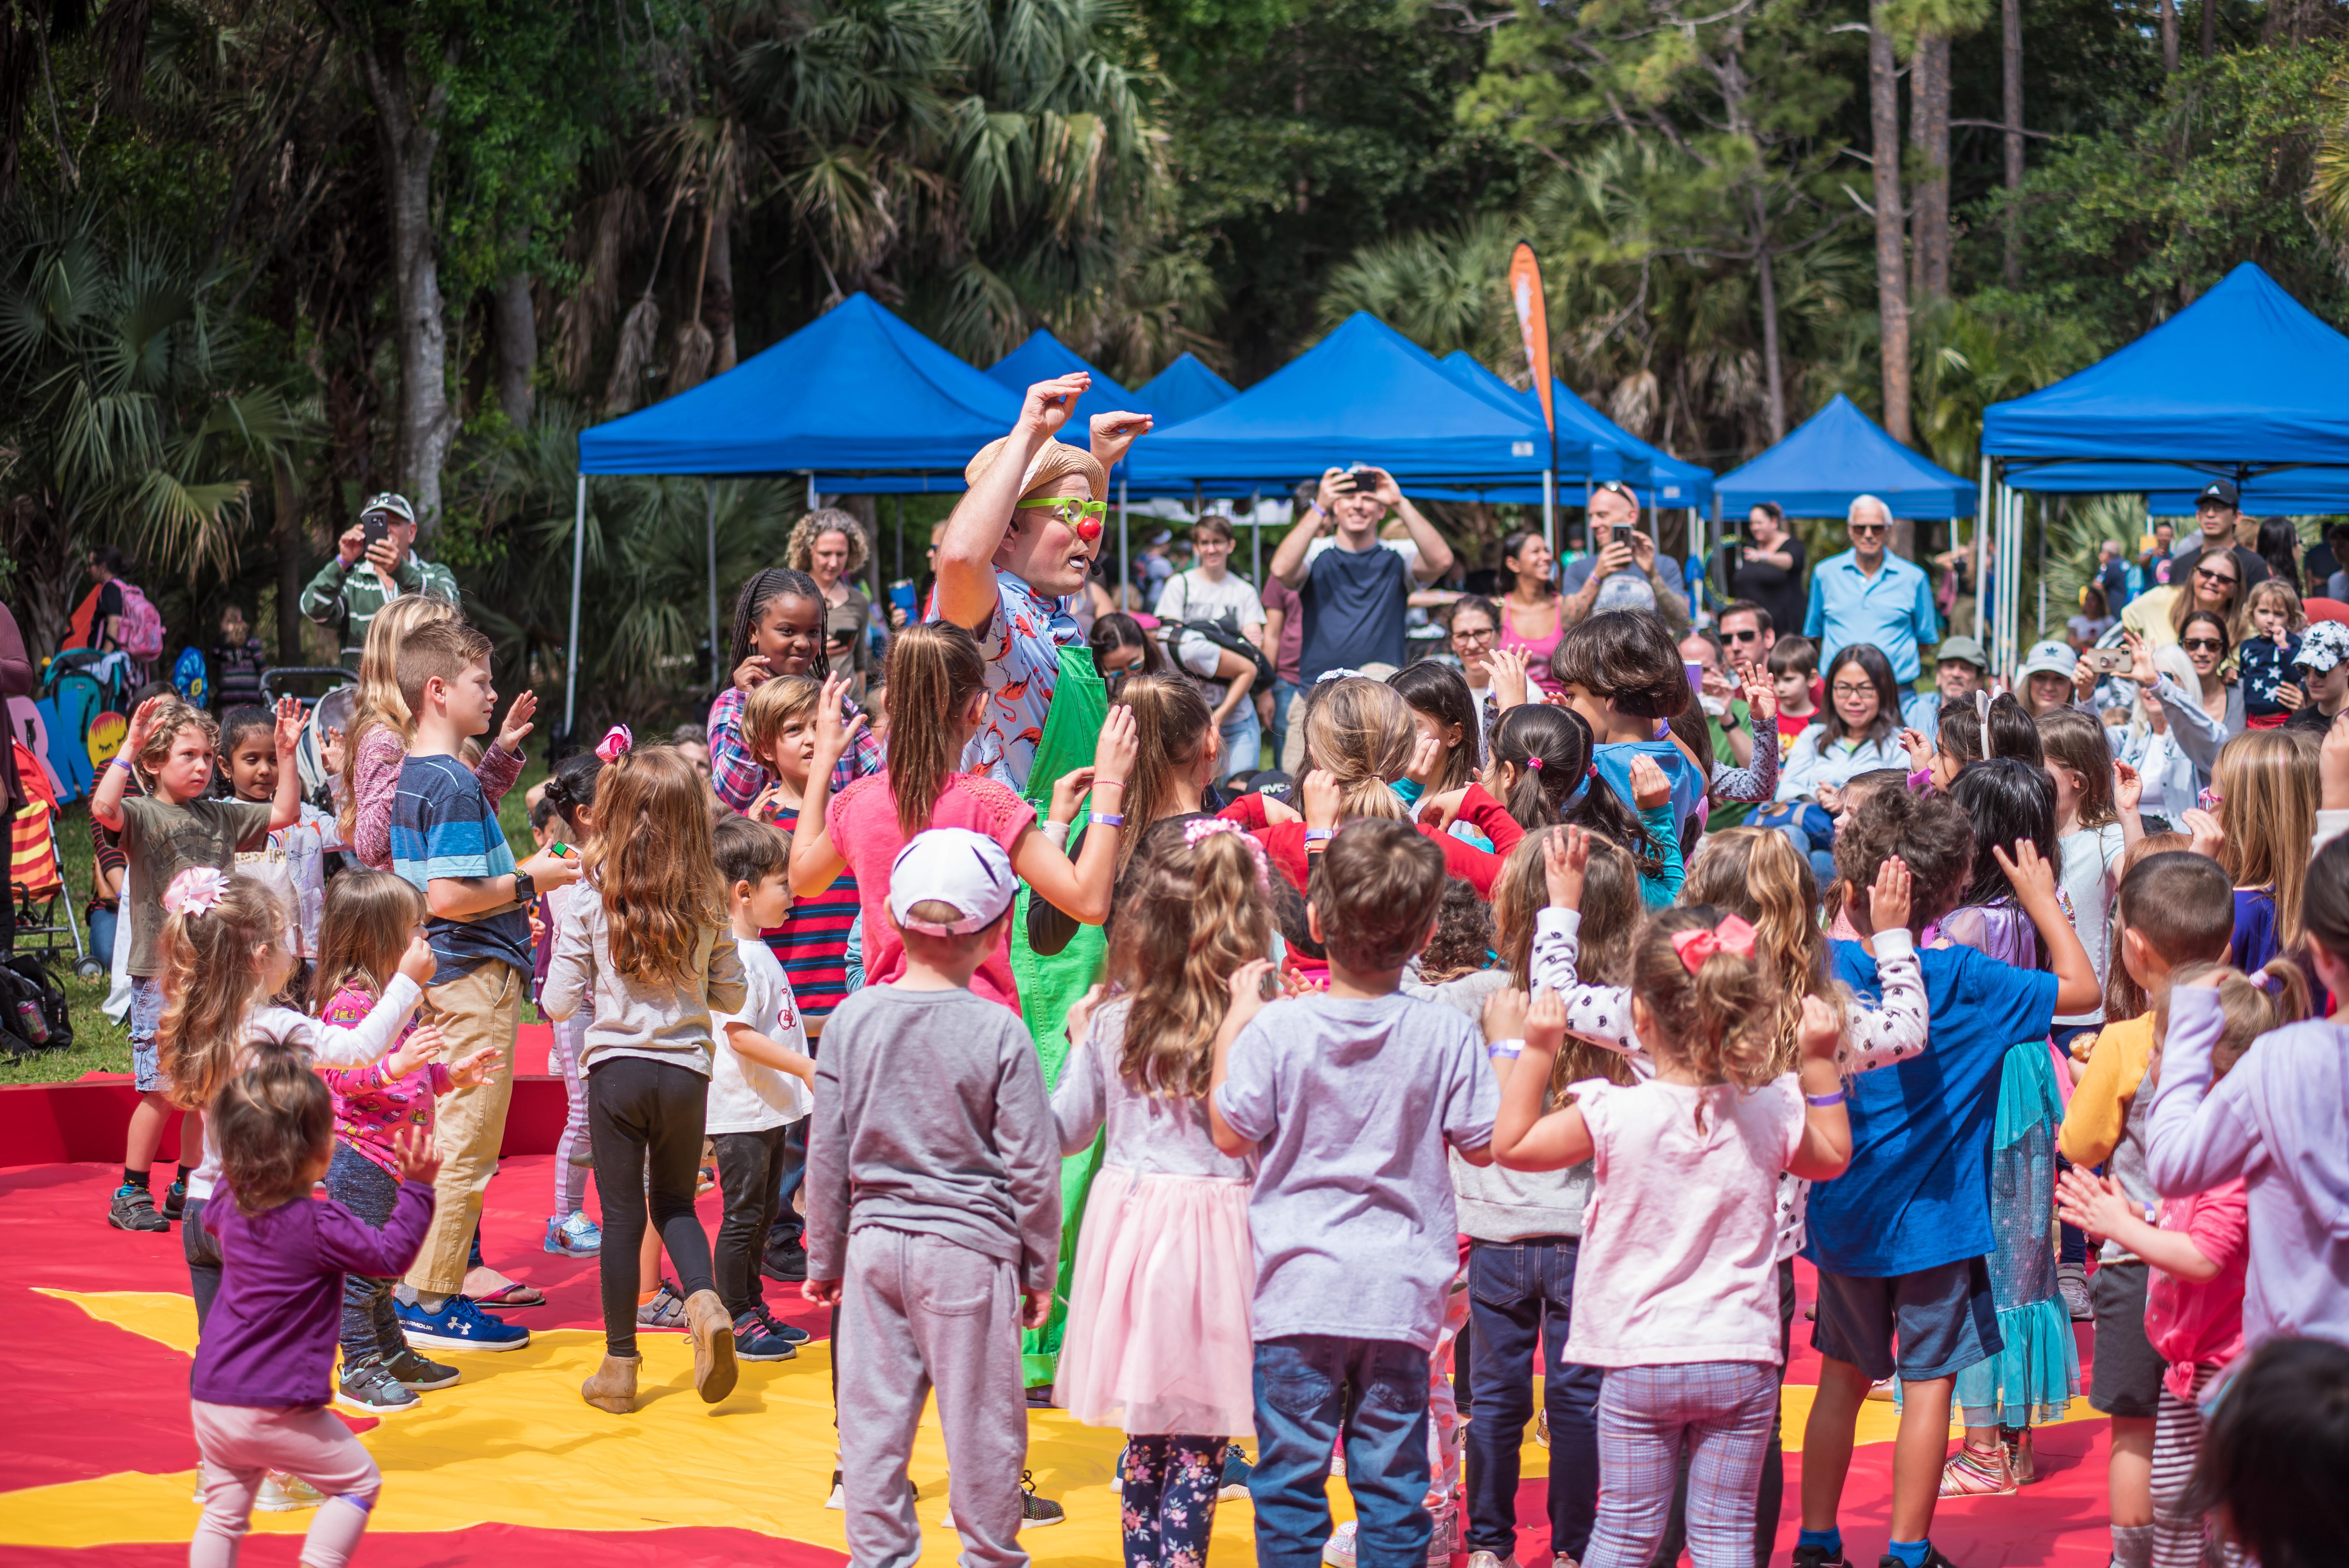 circus crowd